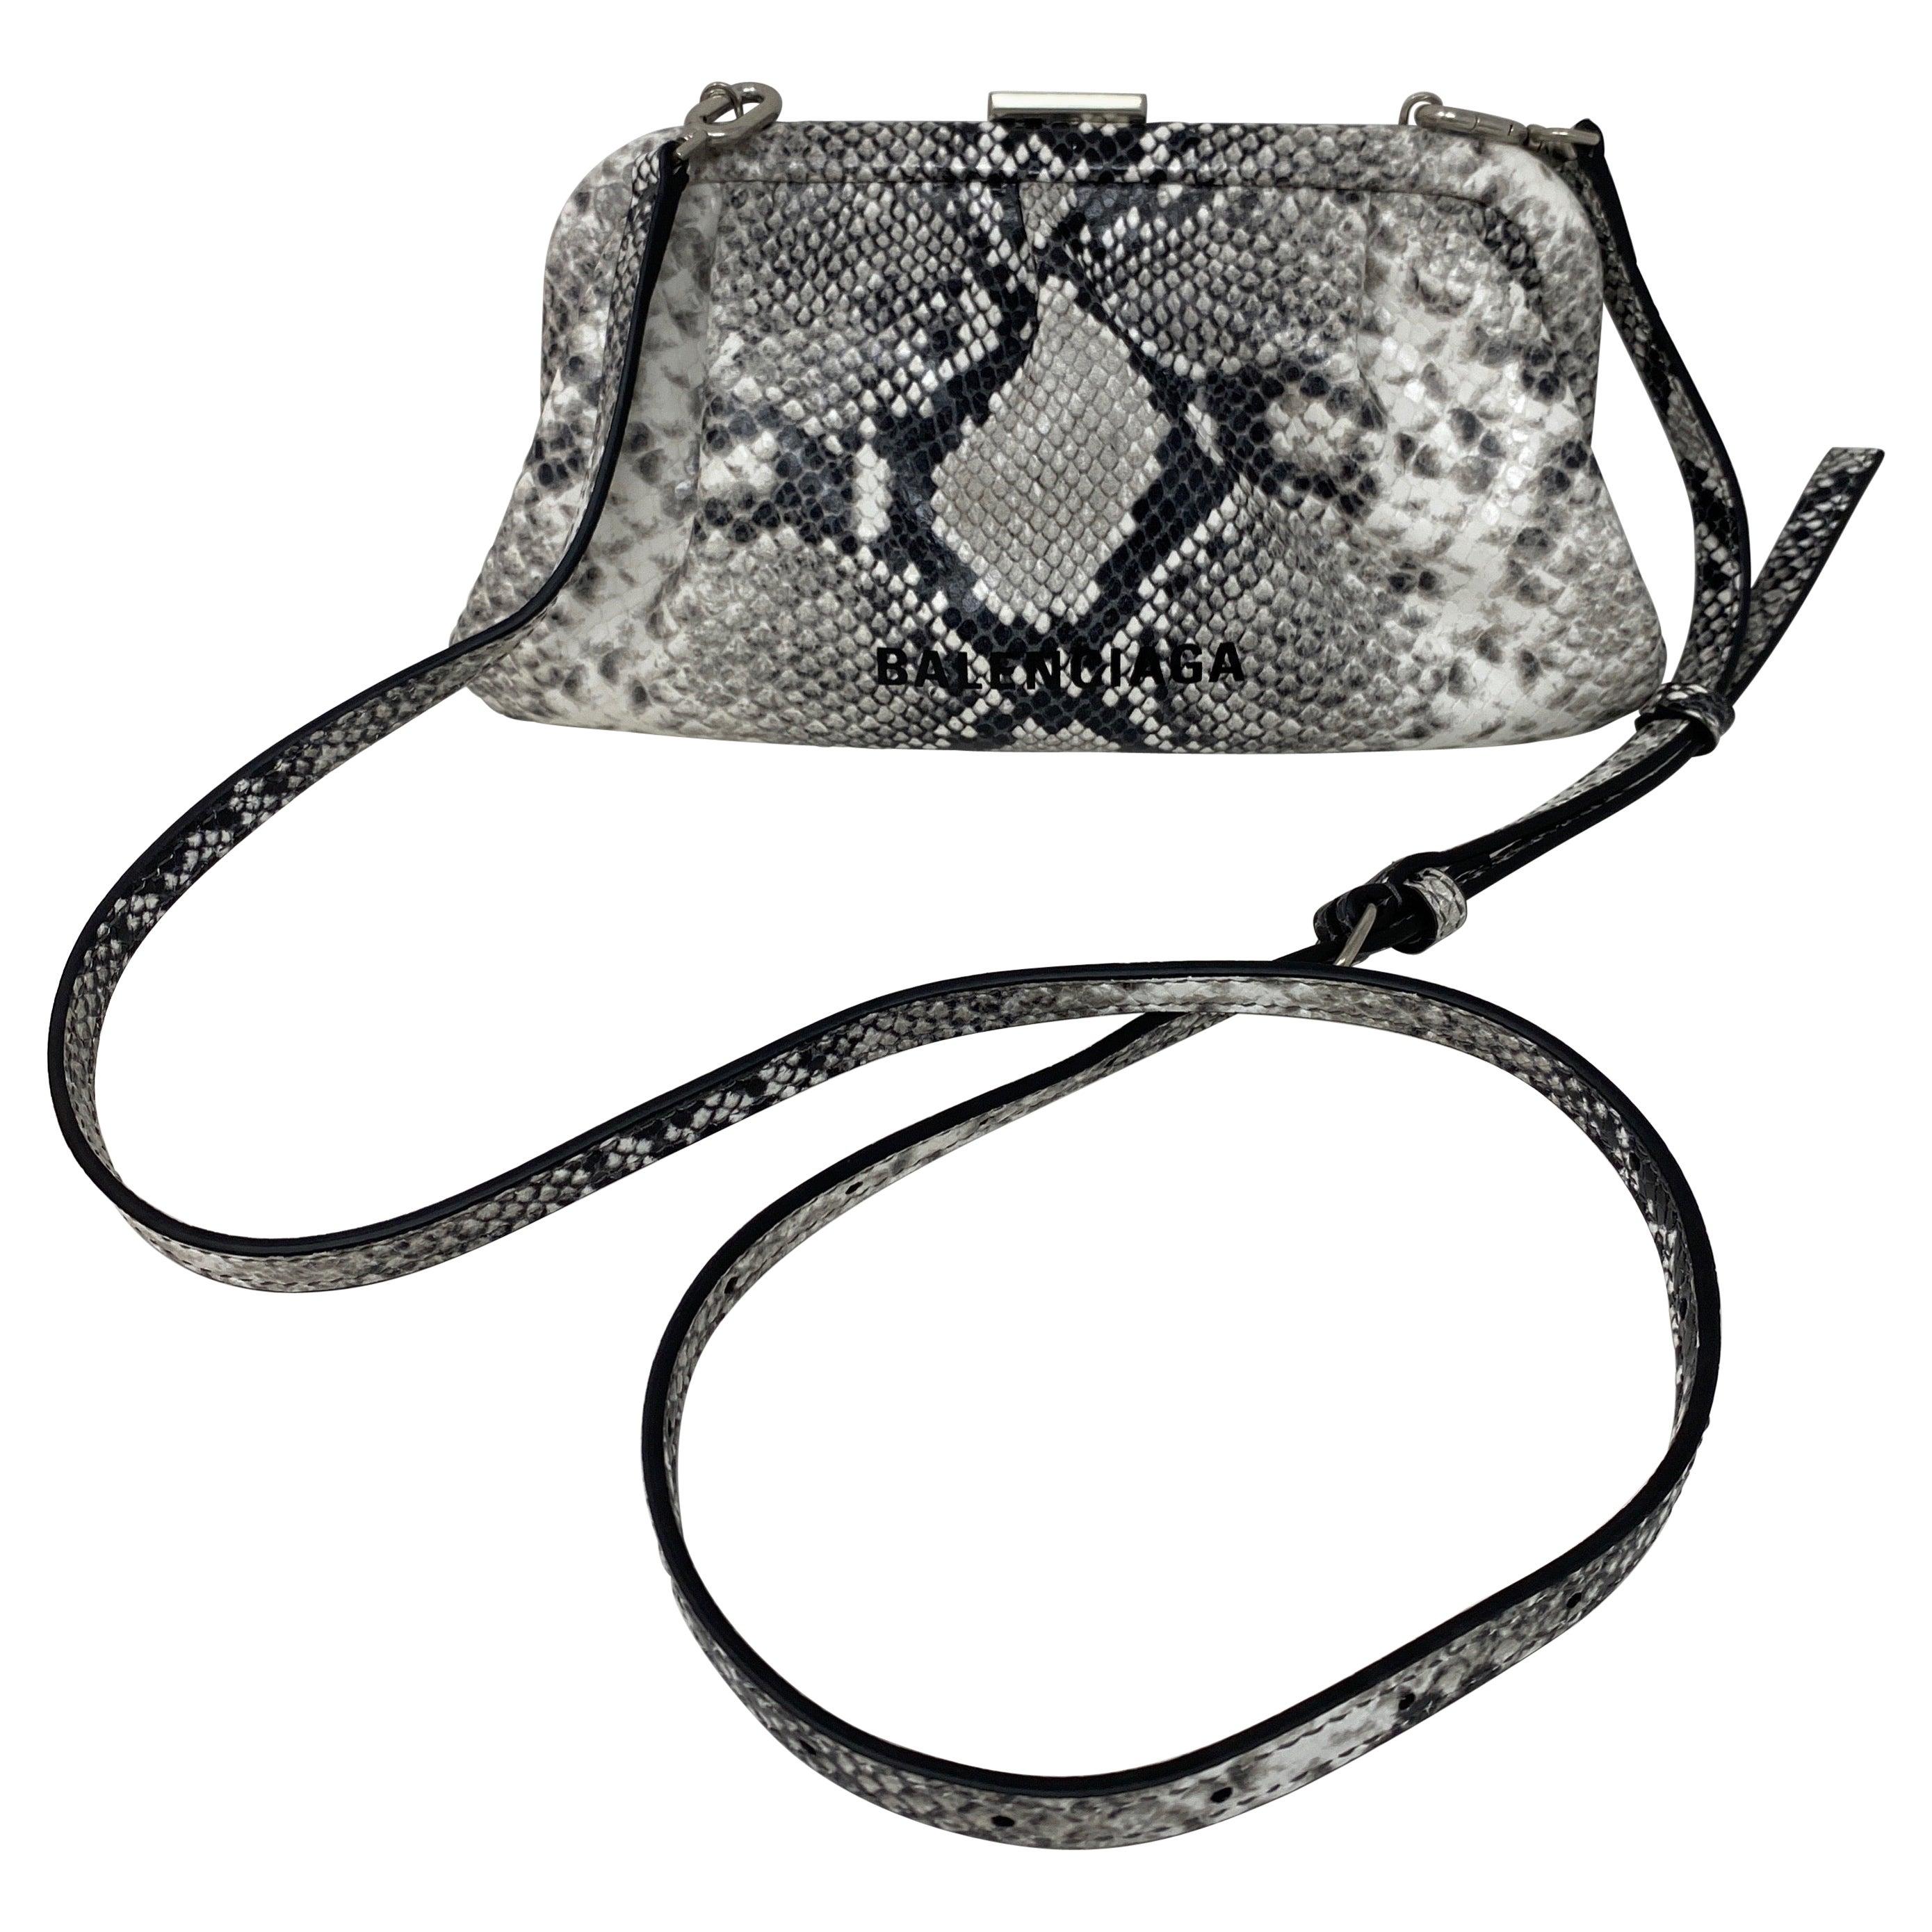 Balenciaga Black and White Crossbody Bag